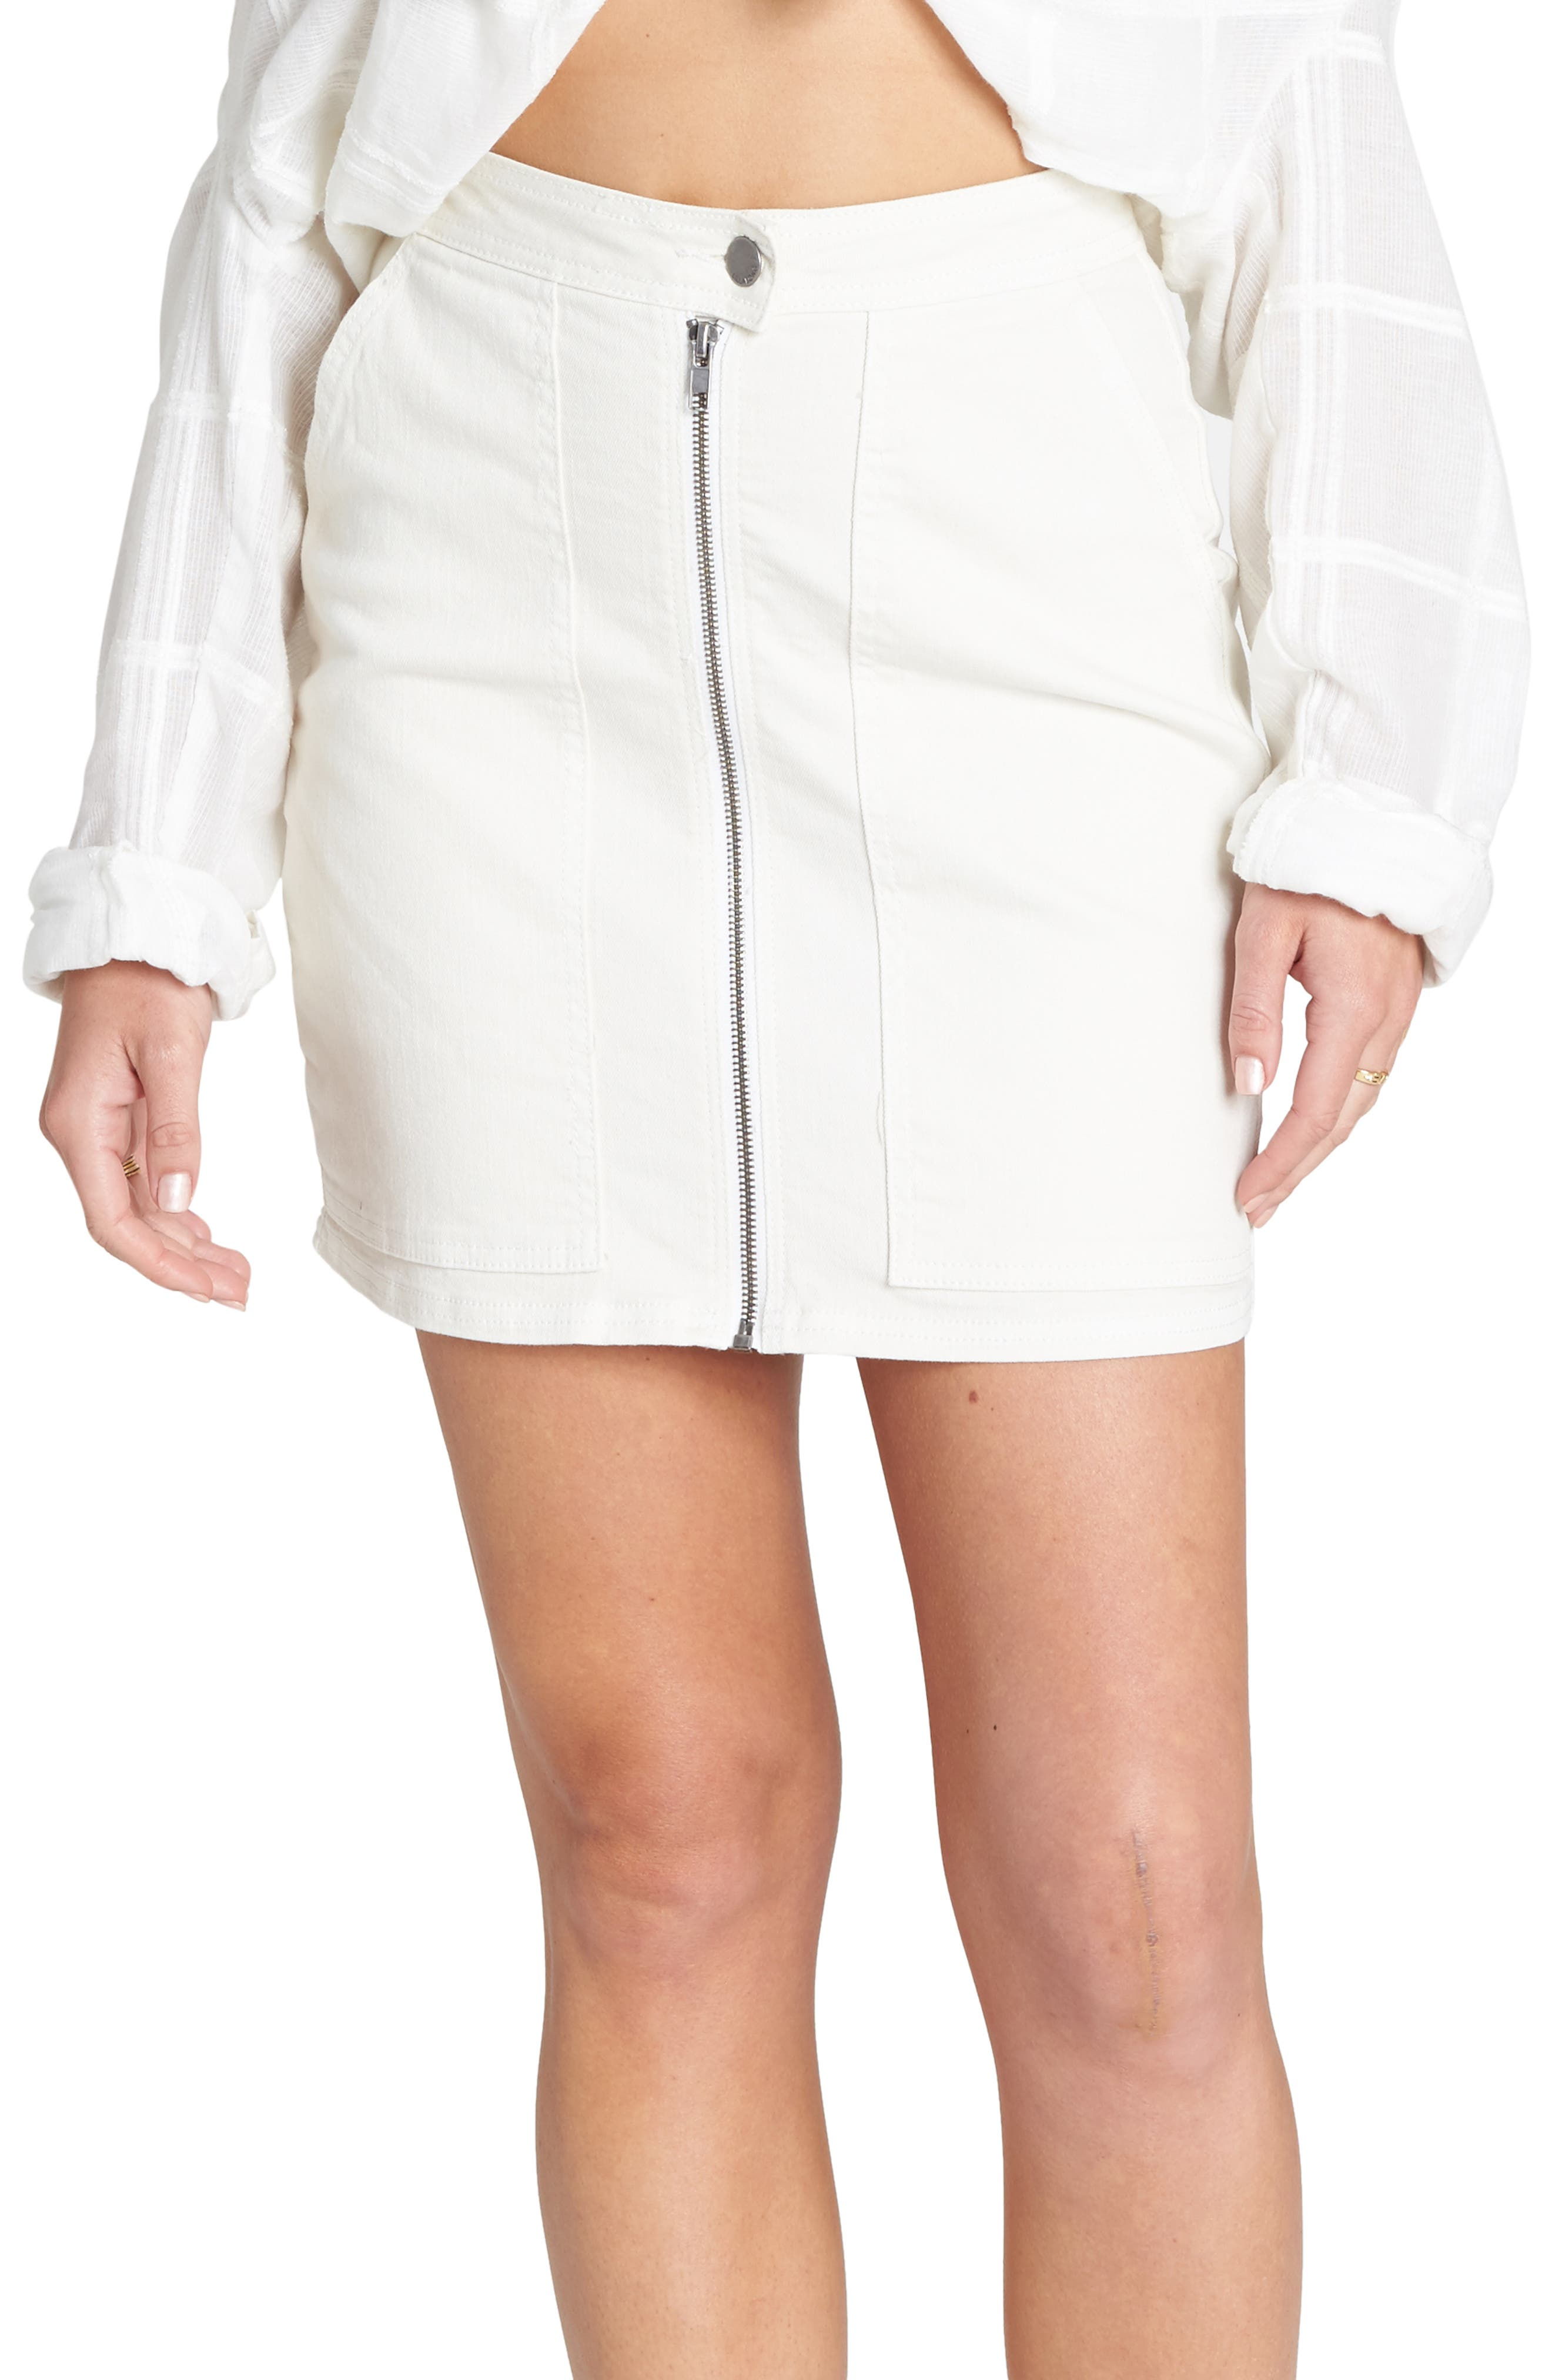 Billabong Ride Right Denim Miniskirt, Ivory